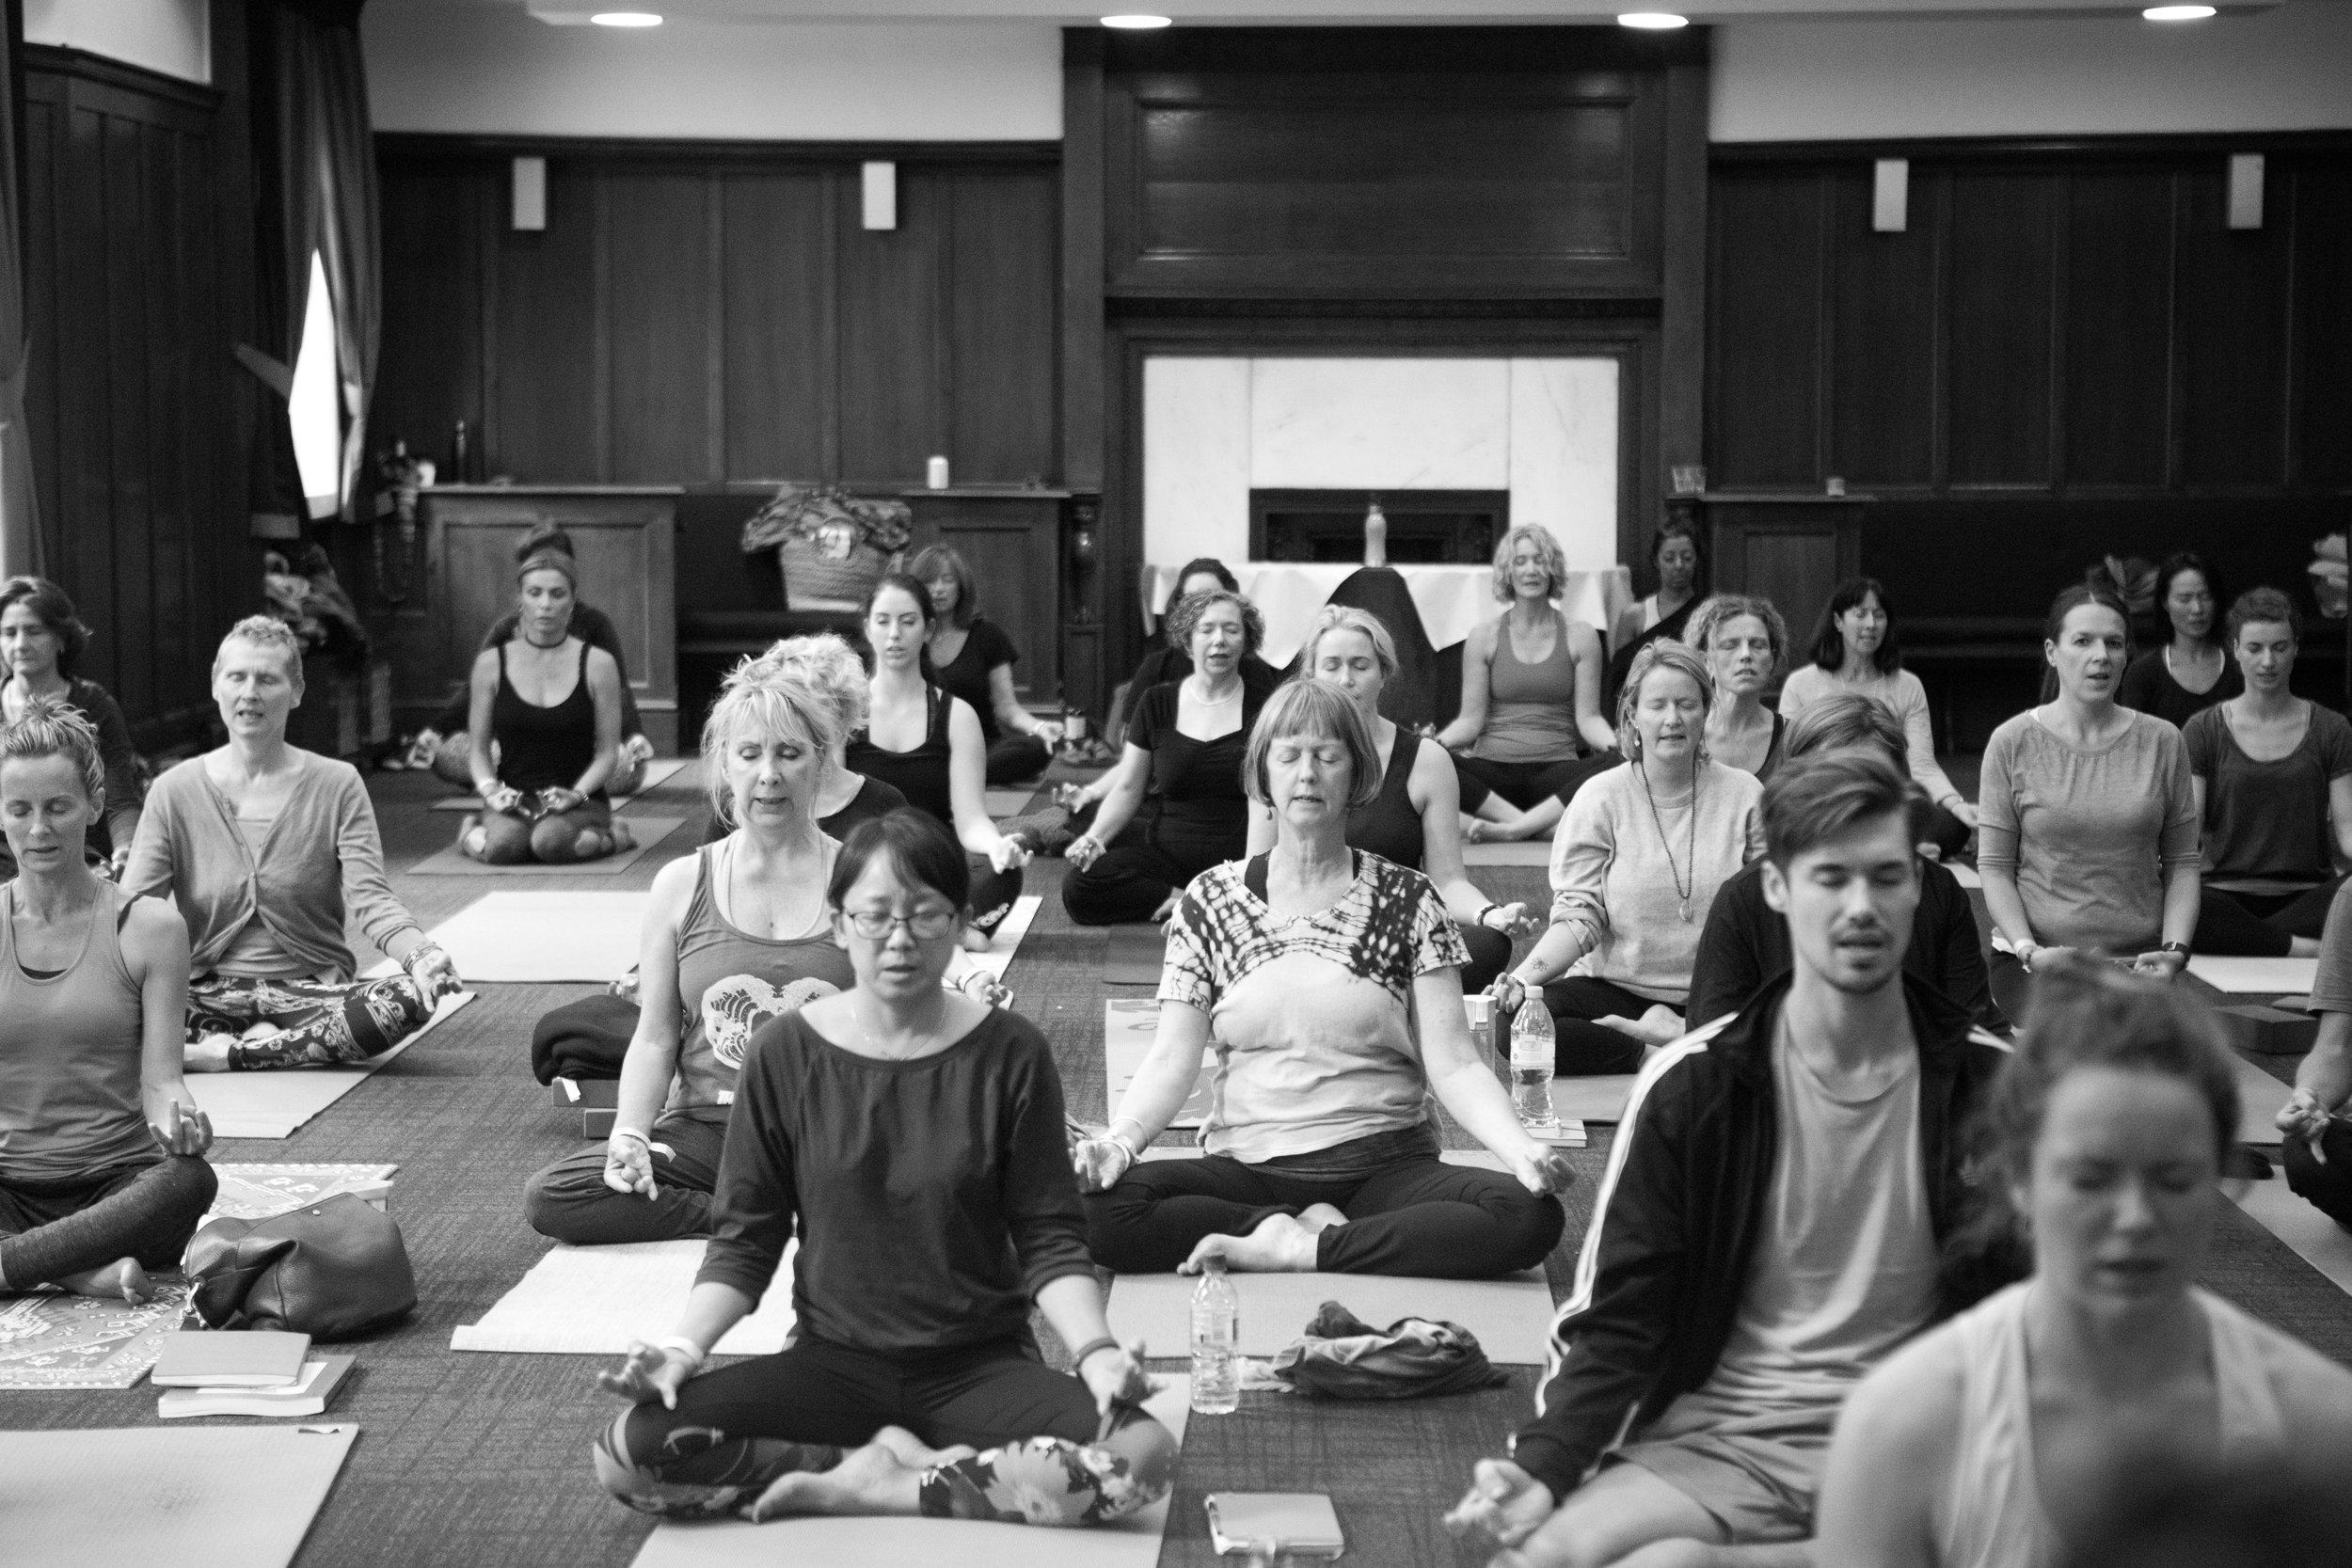 MASTERCLASSES - Practical masterclasses from Asana, Meditation, Chanting and Pranayama to Bodywork, TRE and Anatomy.